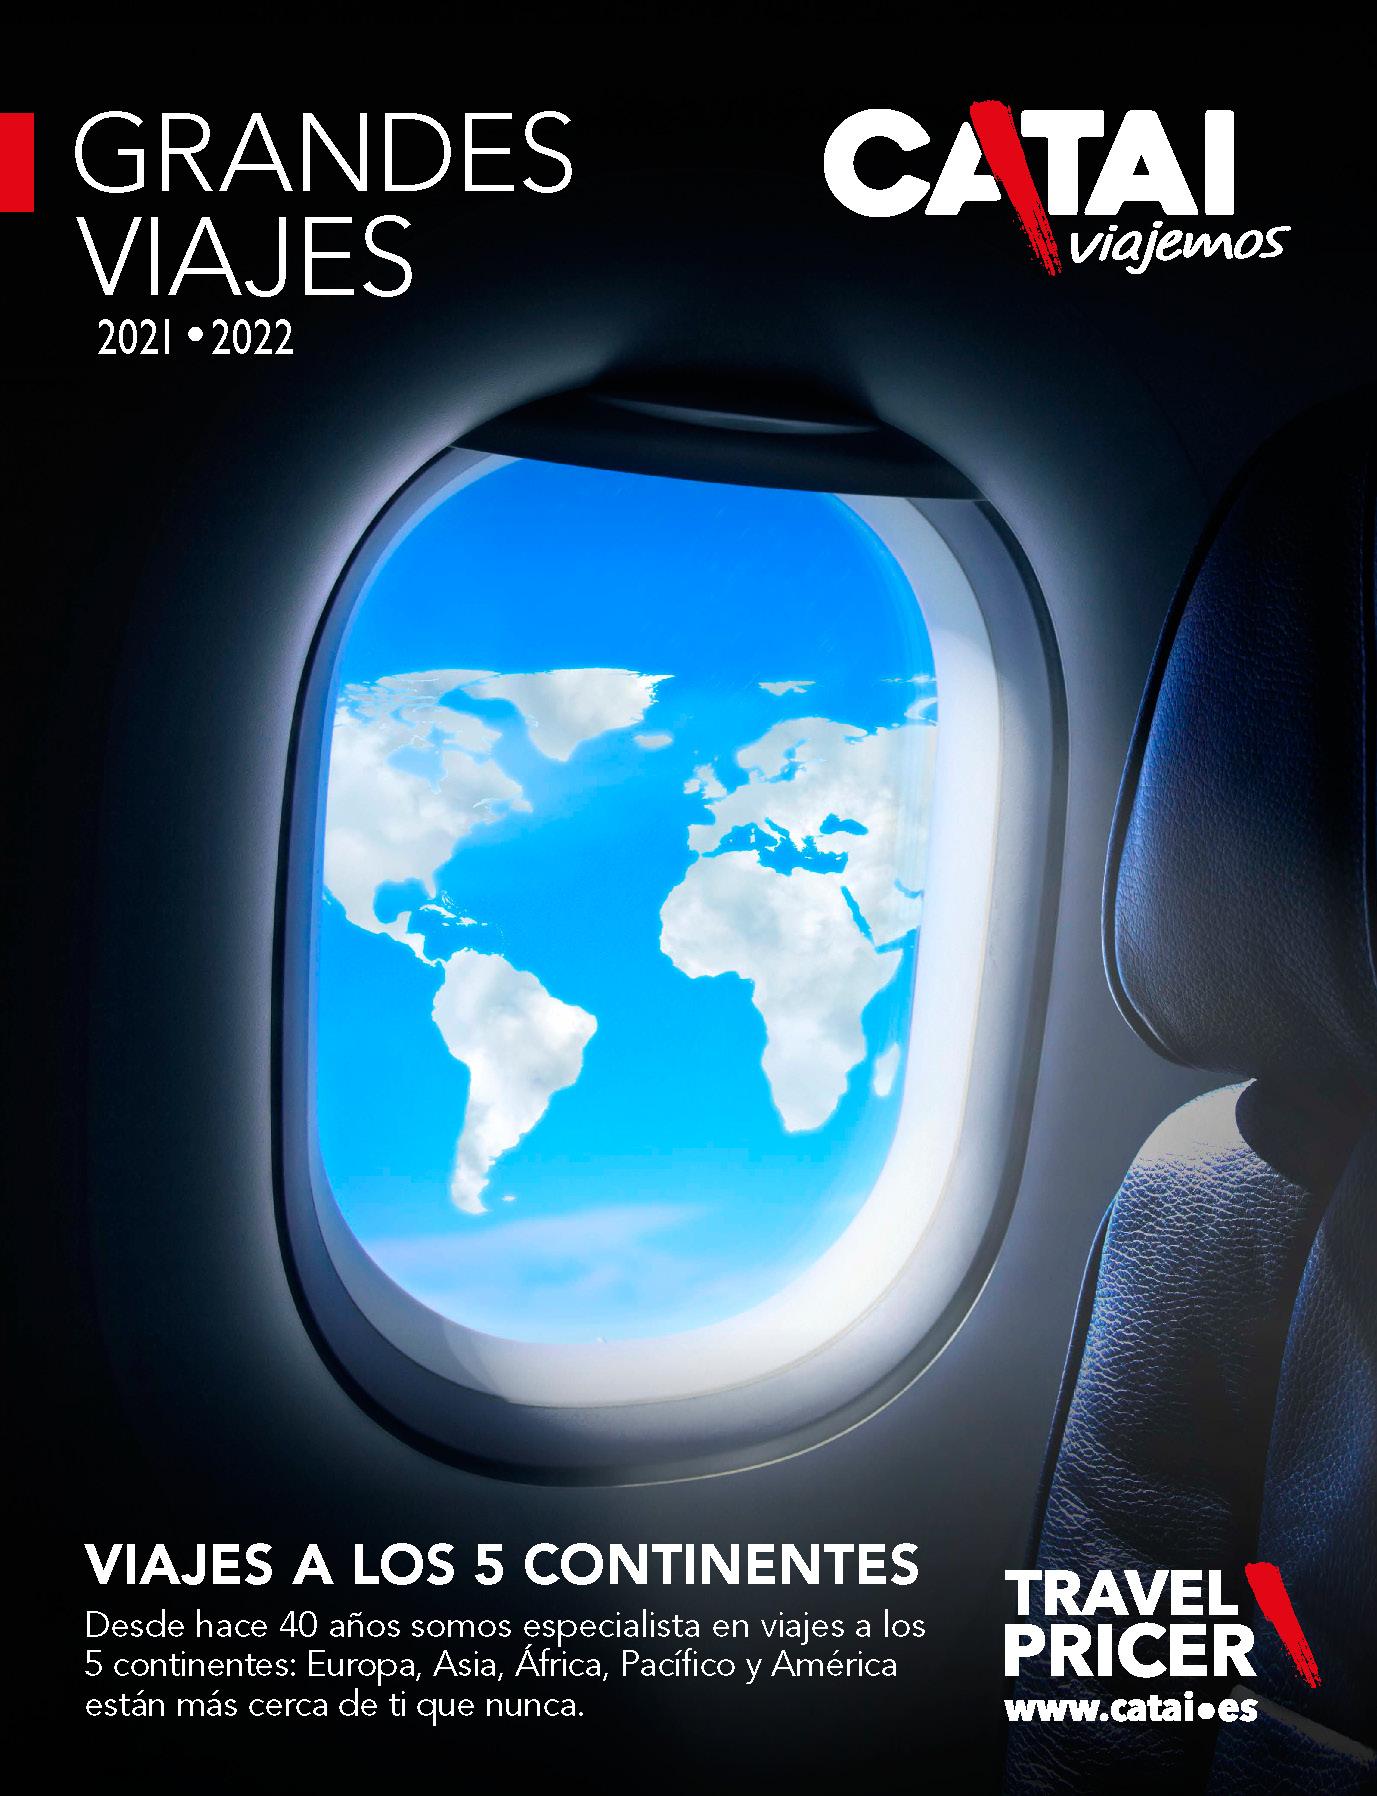 Catalogo General Catai Grandes Viajes 2021